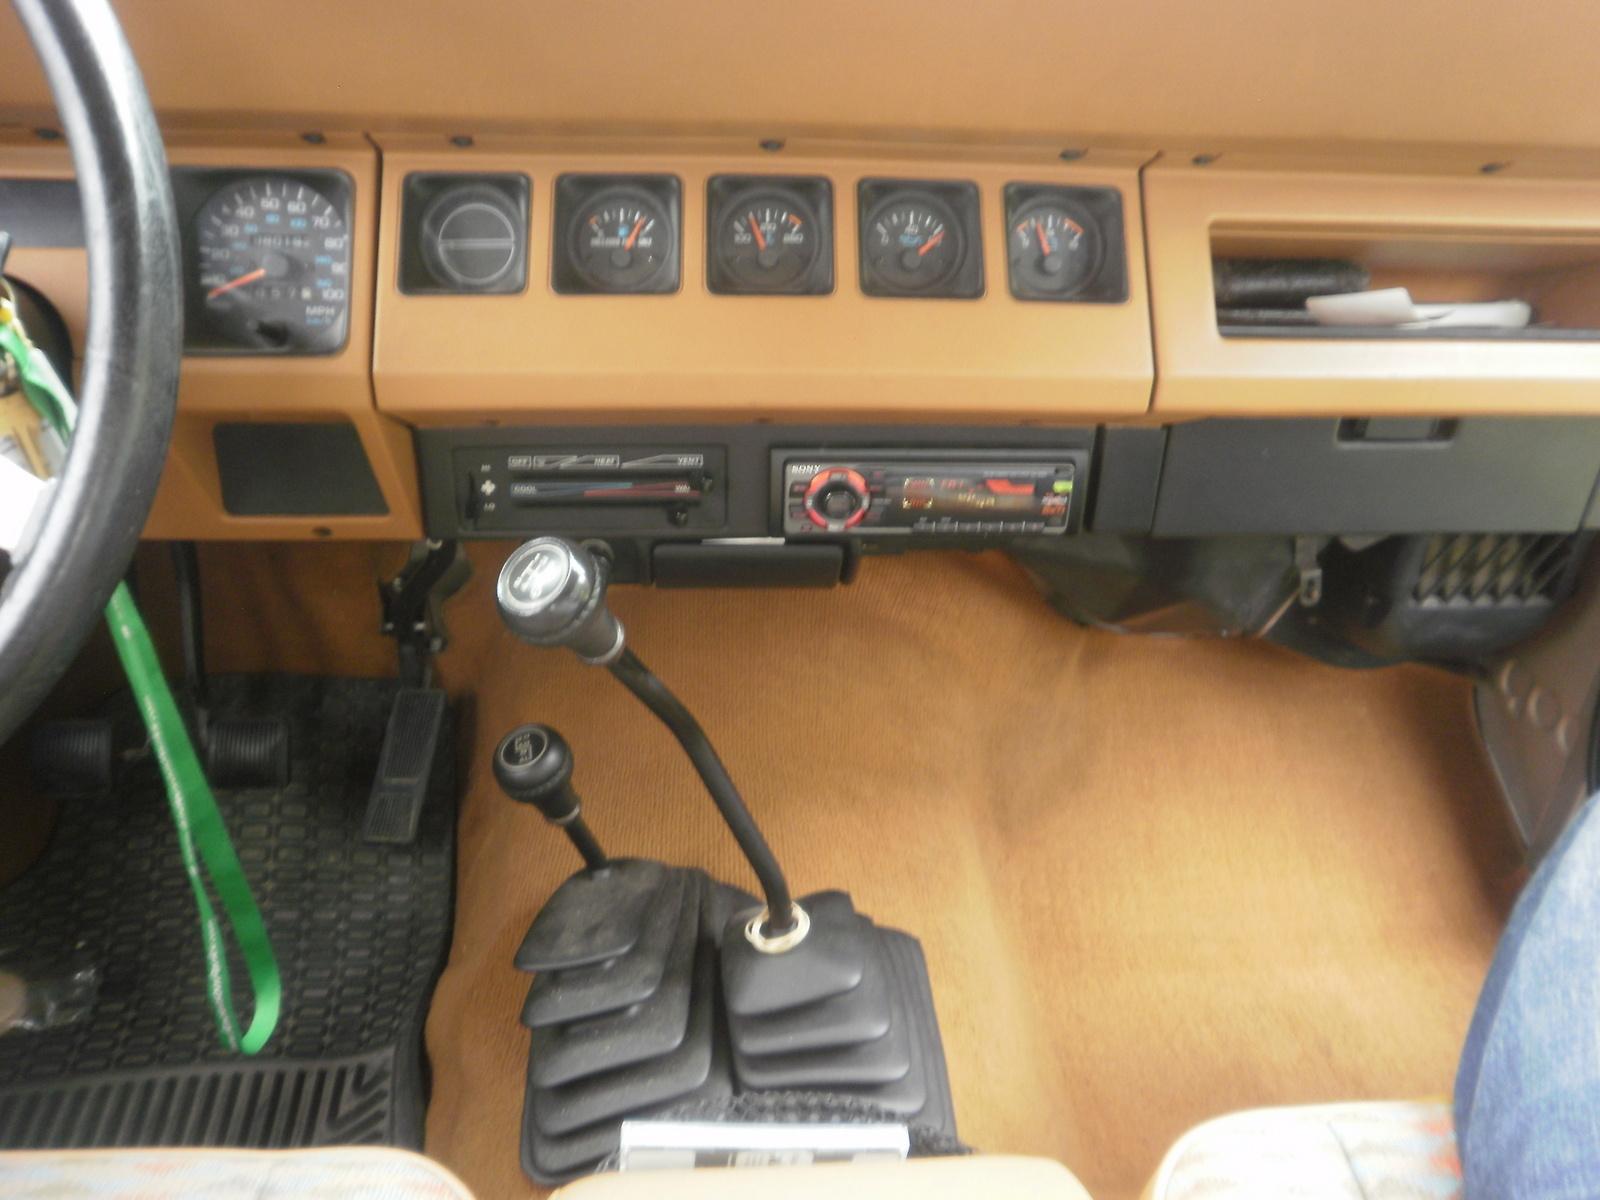 1995 jeep wrangler interior pictures cargurus for Interior wrangler yj